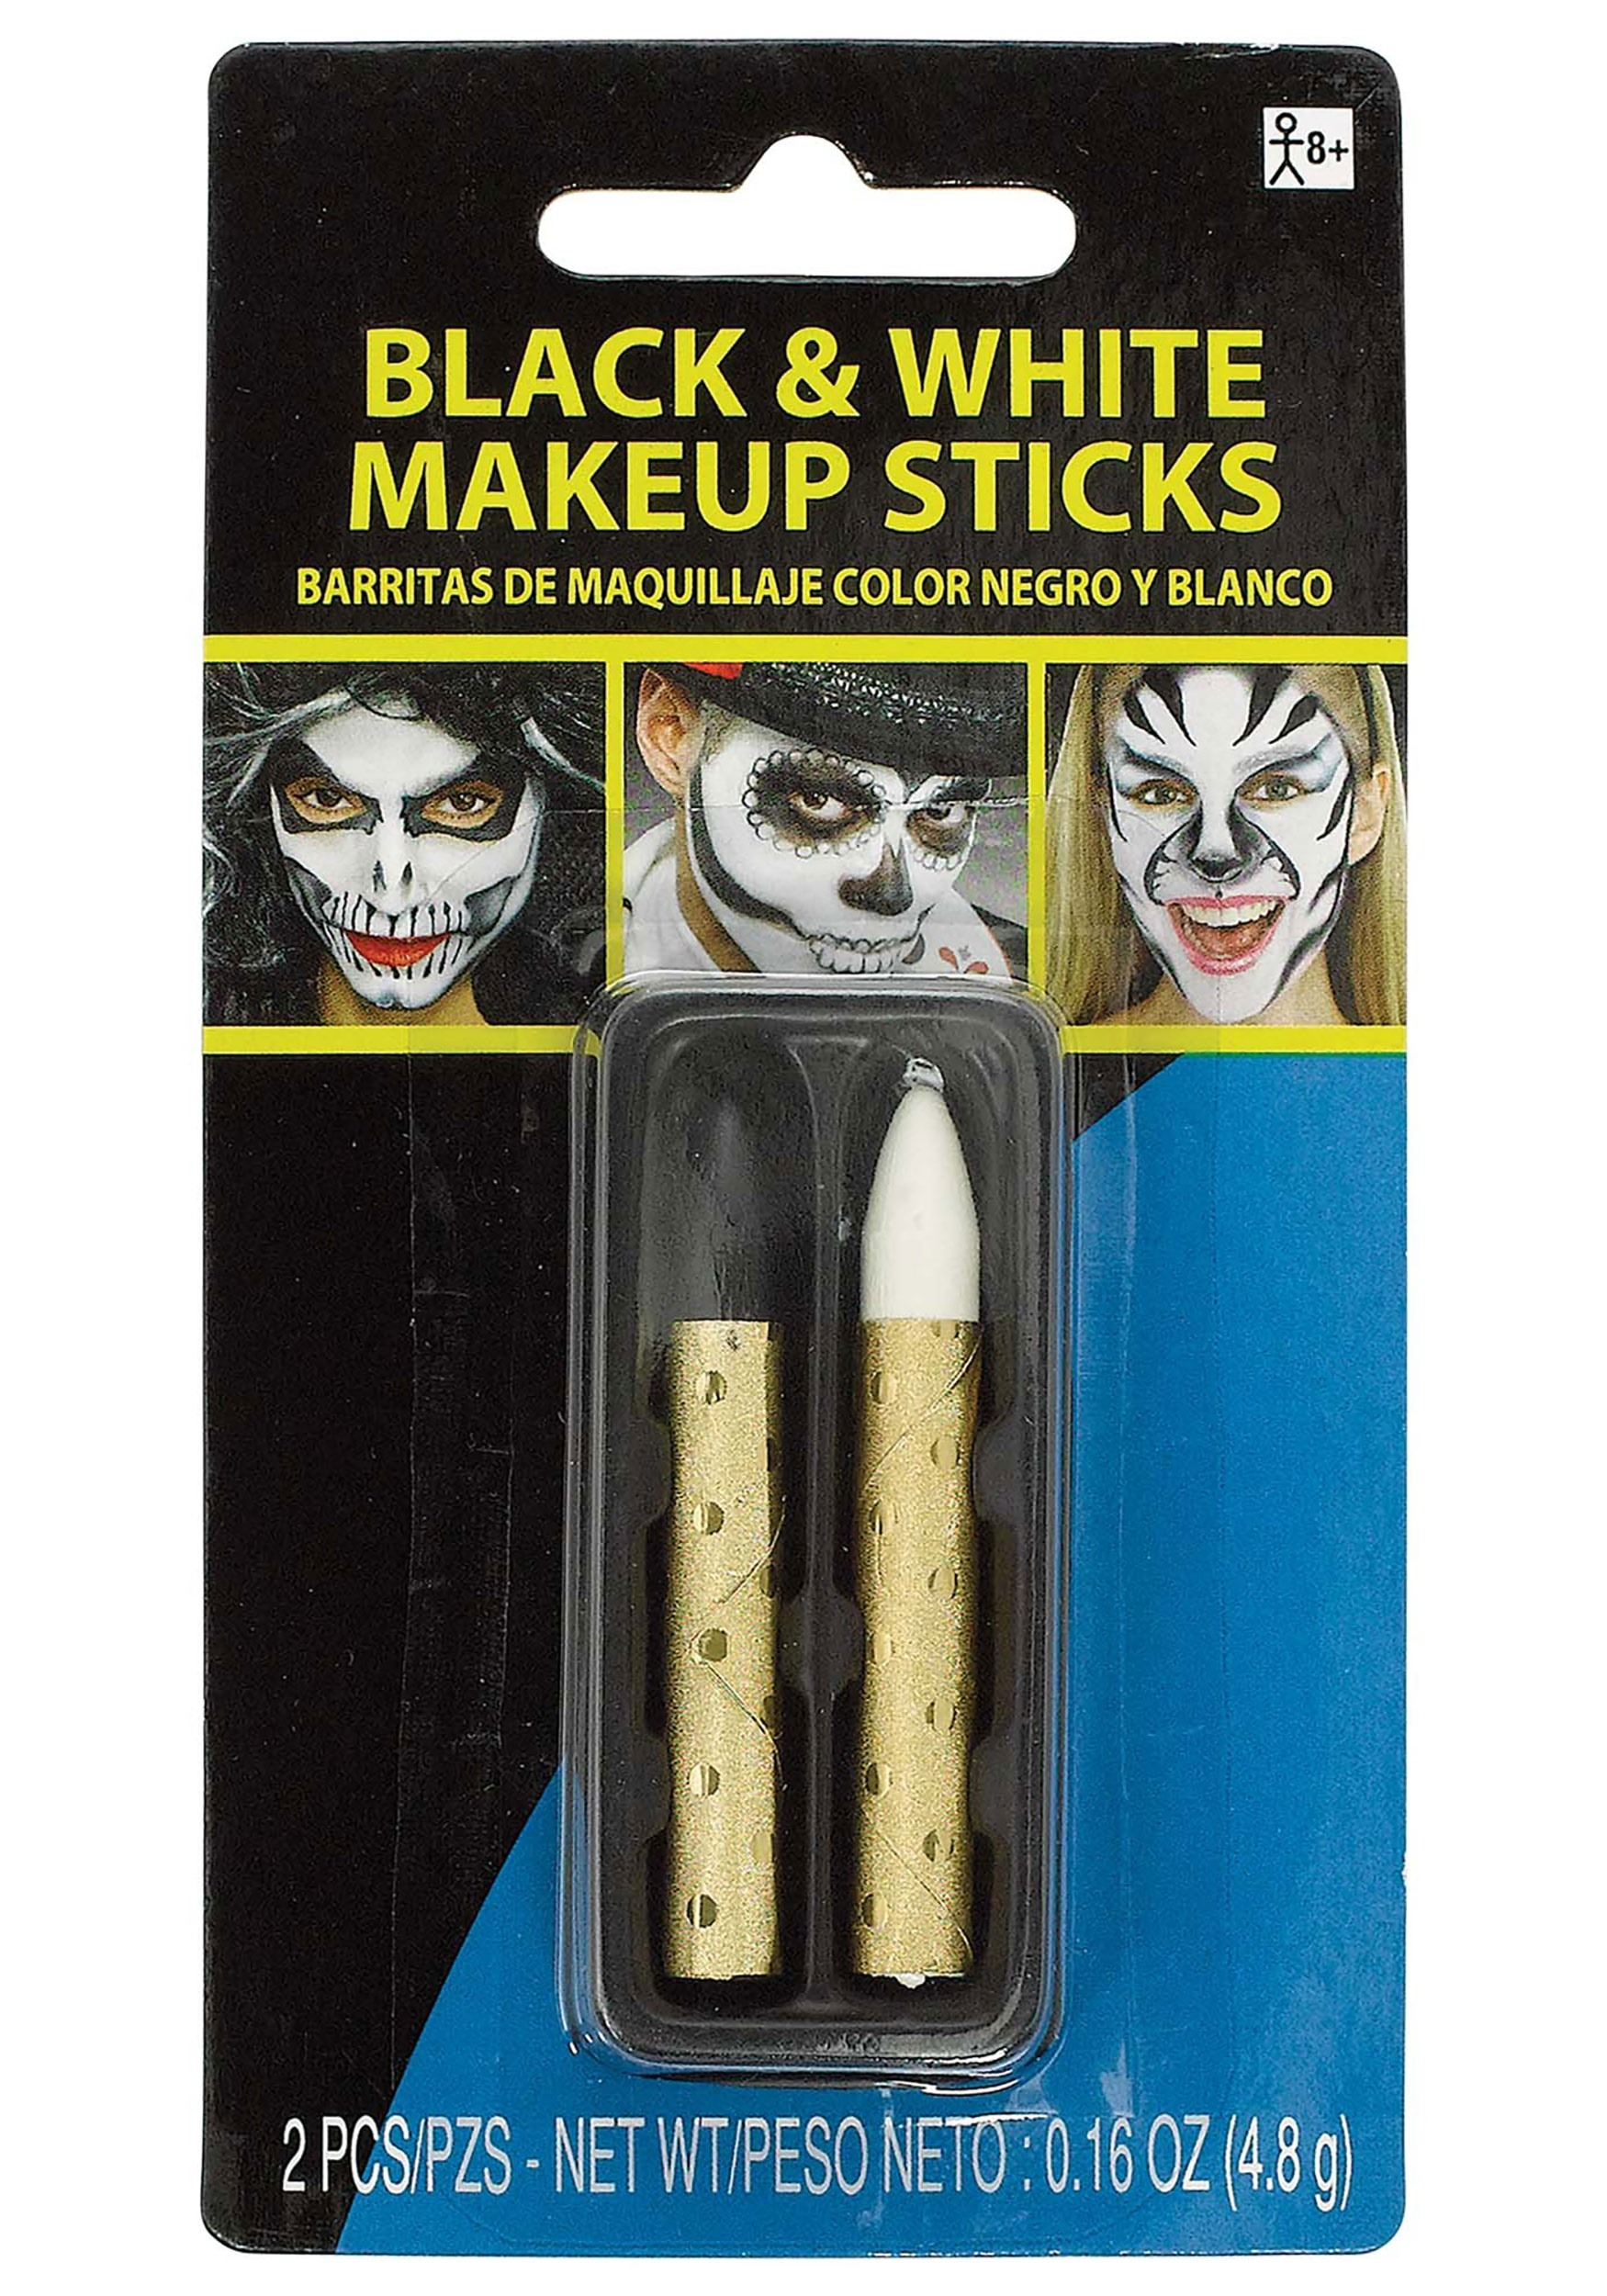 Makeup_Sticks-_Black_and_White